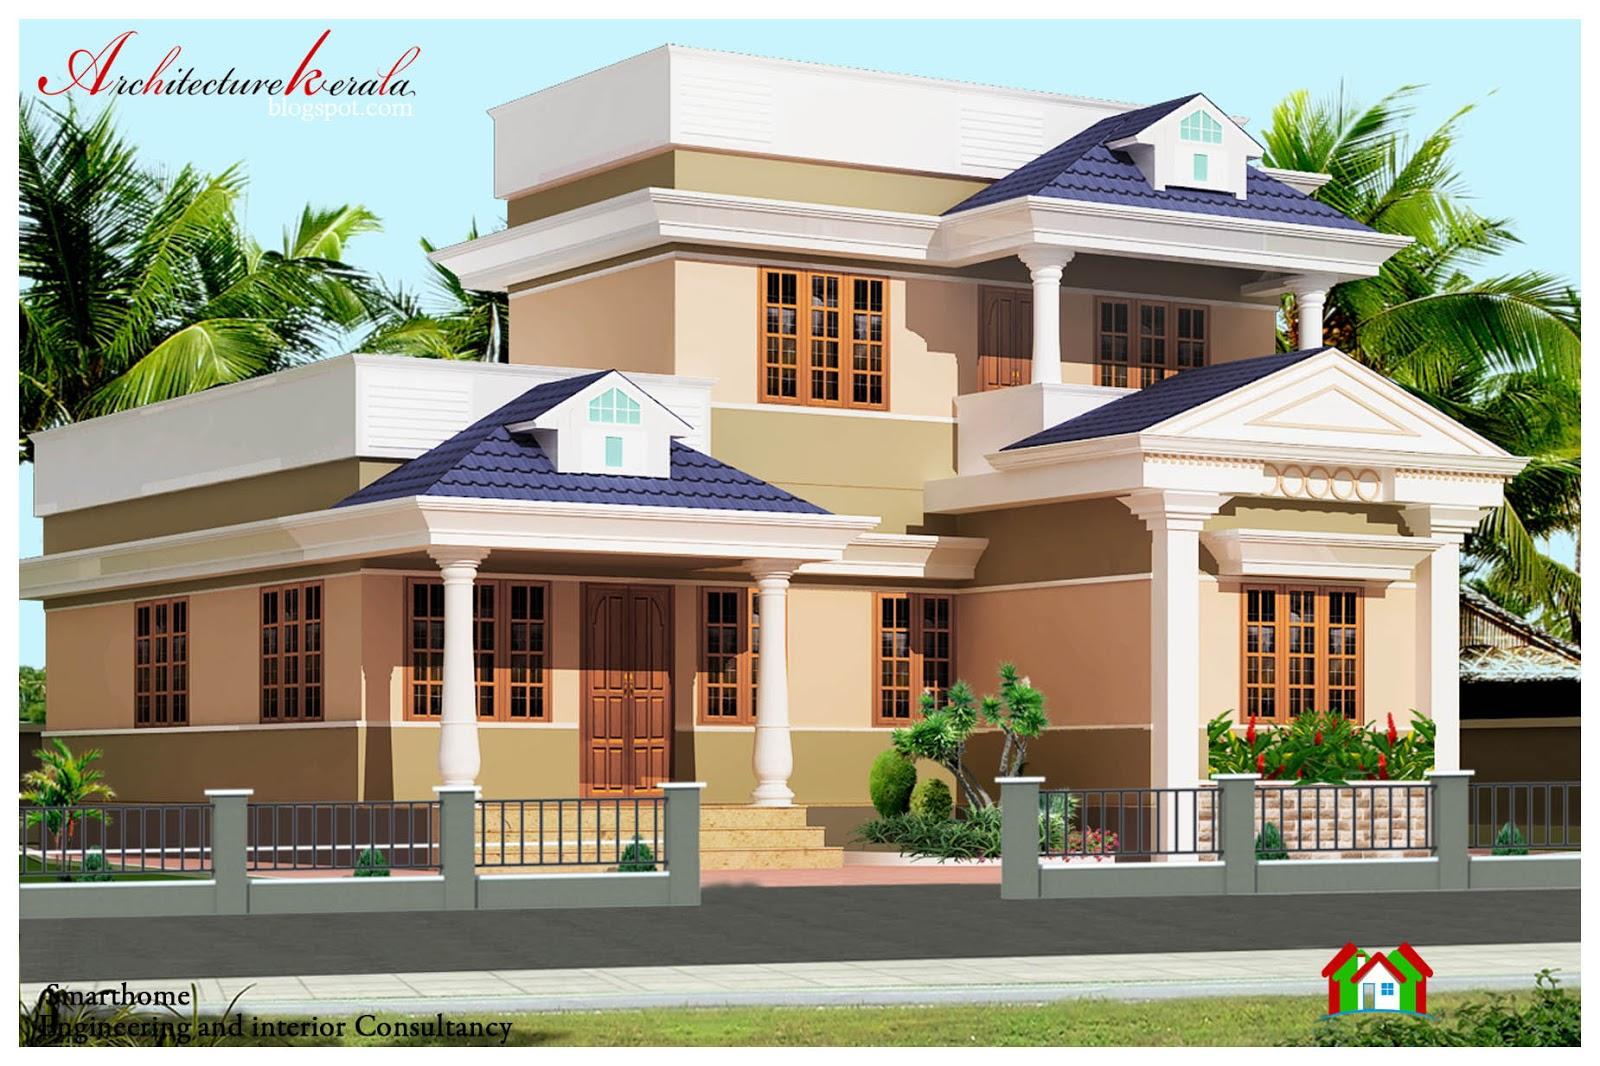 Architecture Kerala 1000 Sq Ft KERALA STYLE HOUSE PLAN